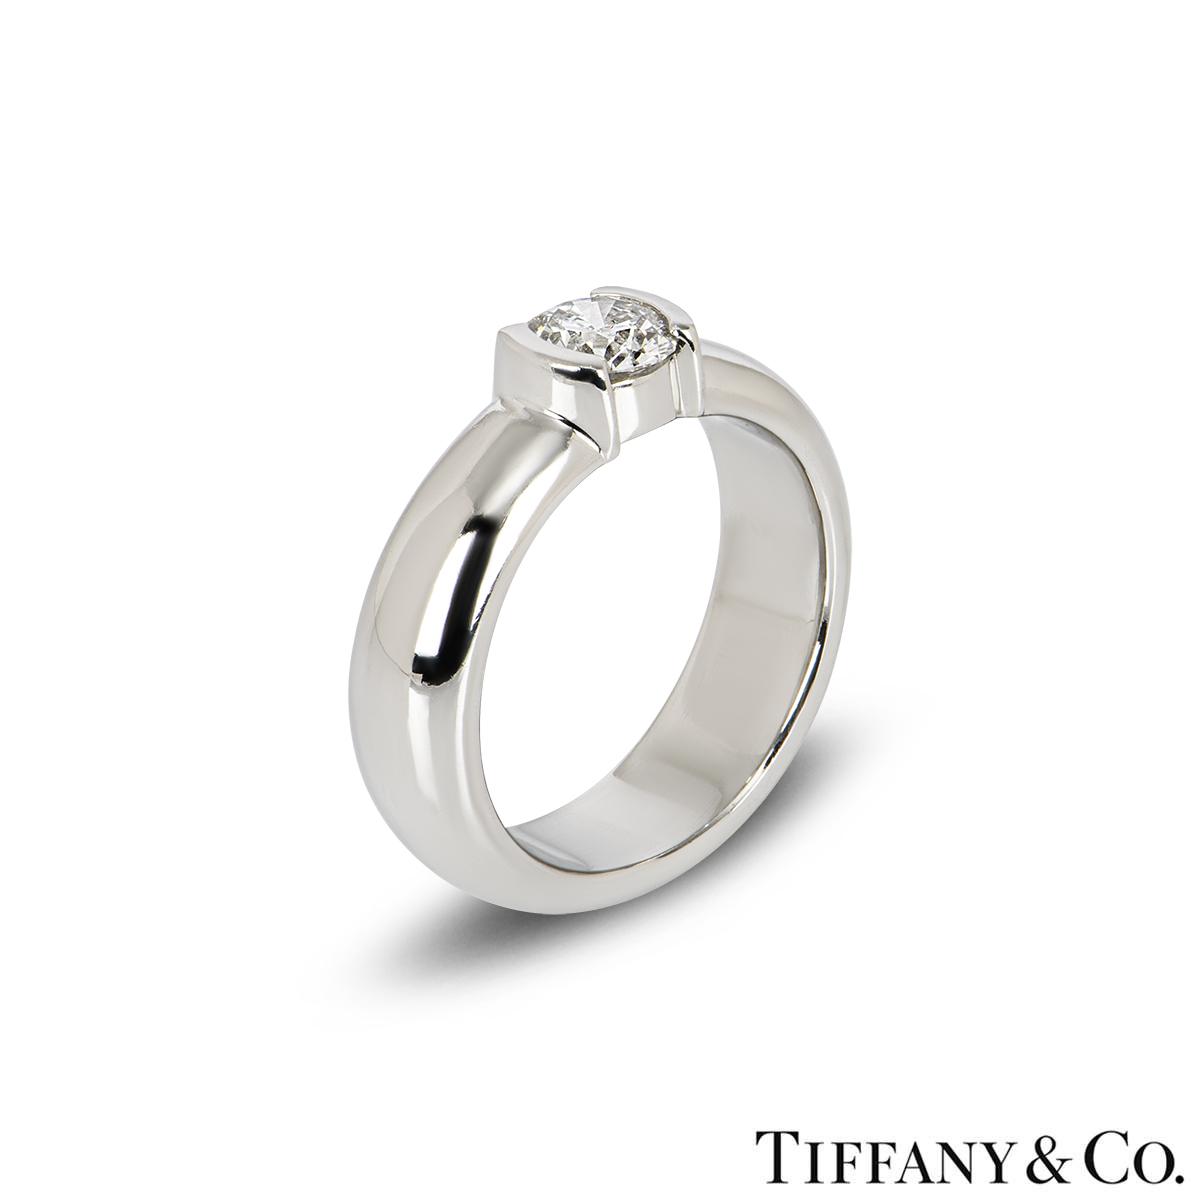 Tiffany & Co. Diamond Etoile Platinum Ring 0.50ct F/VS1